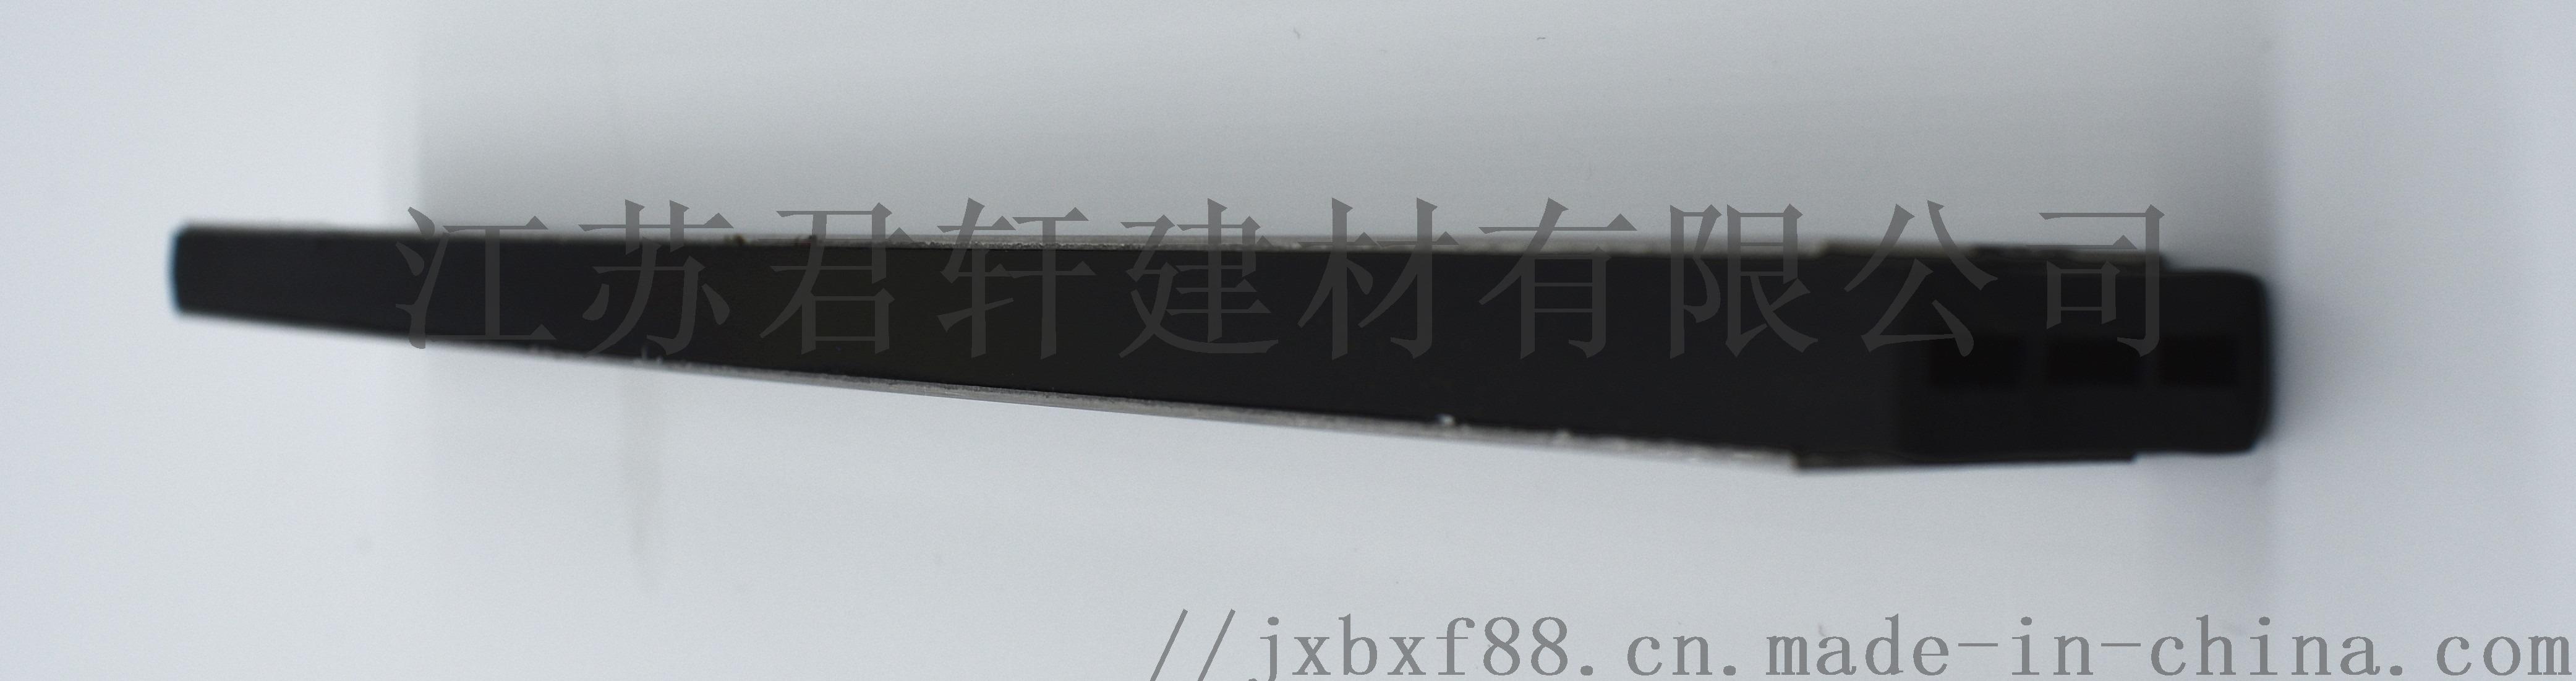 DSC_0060.JPG